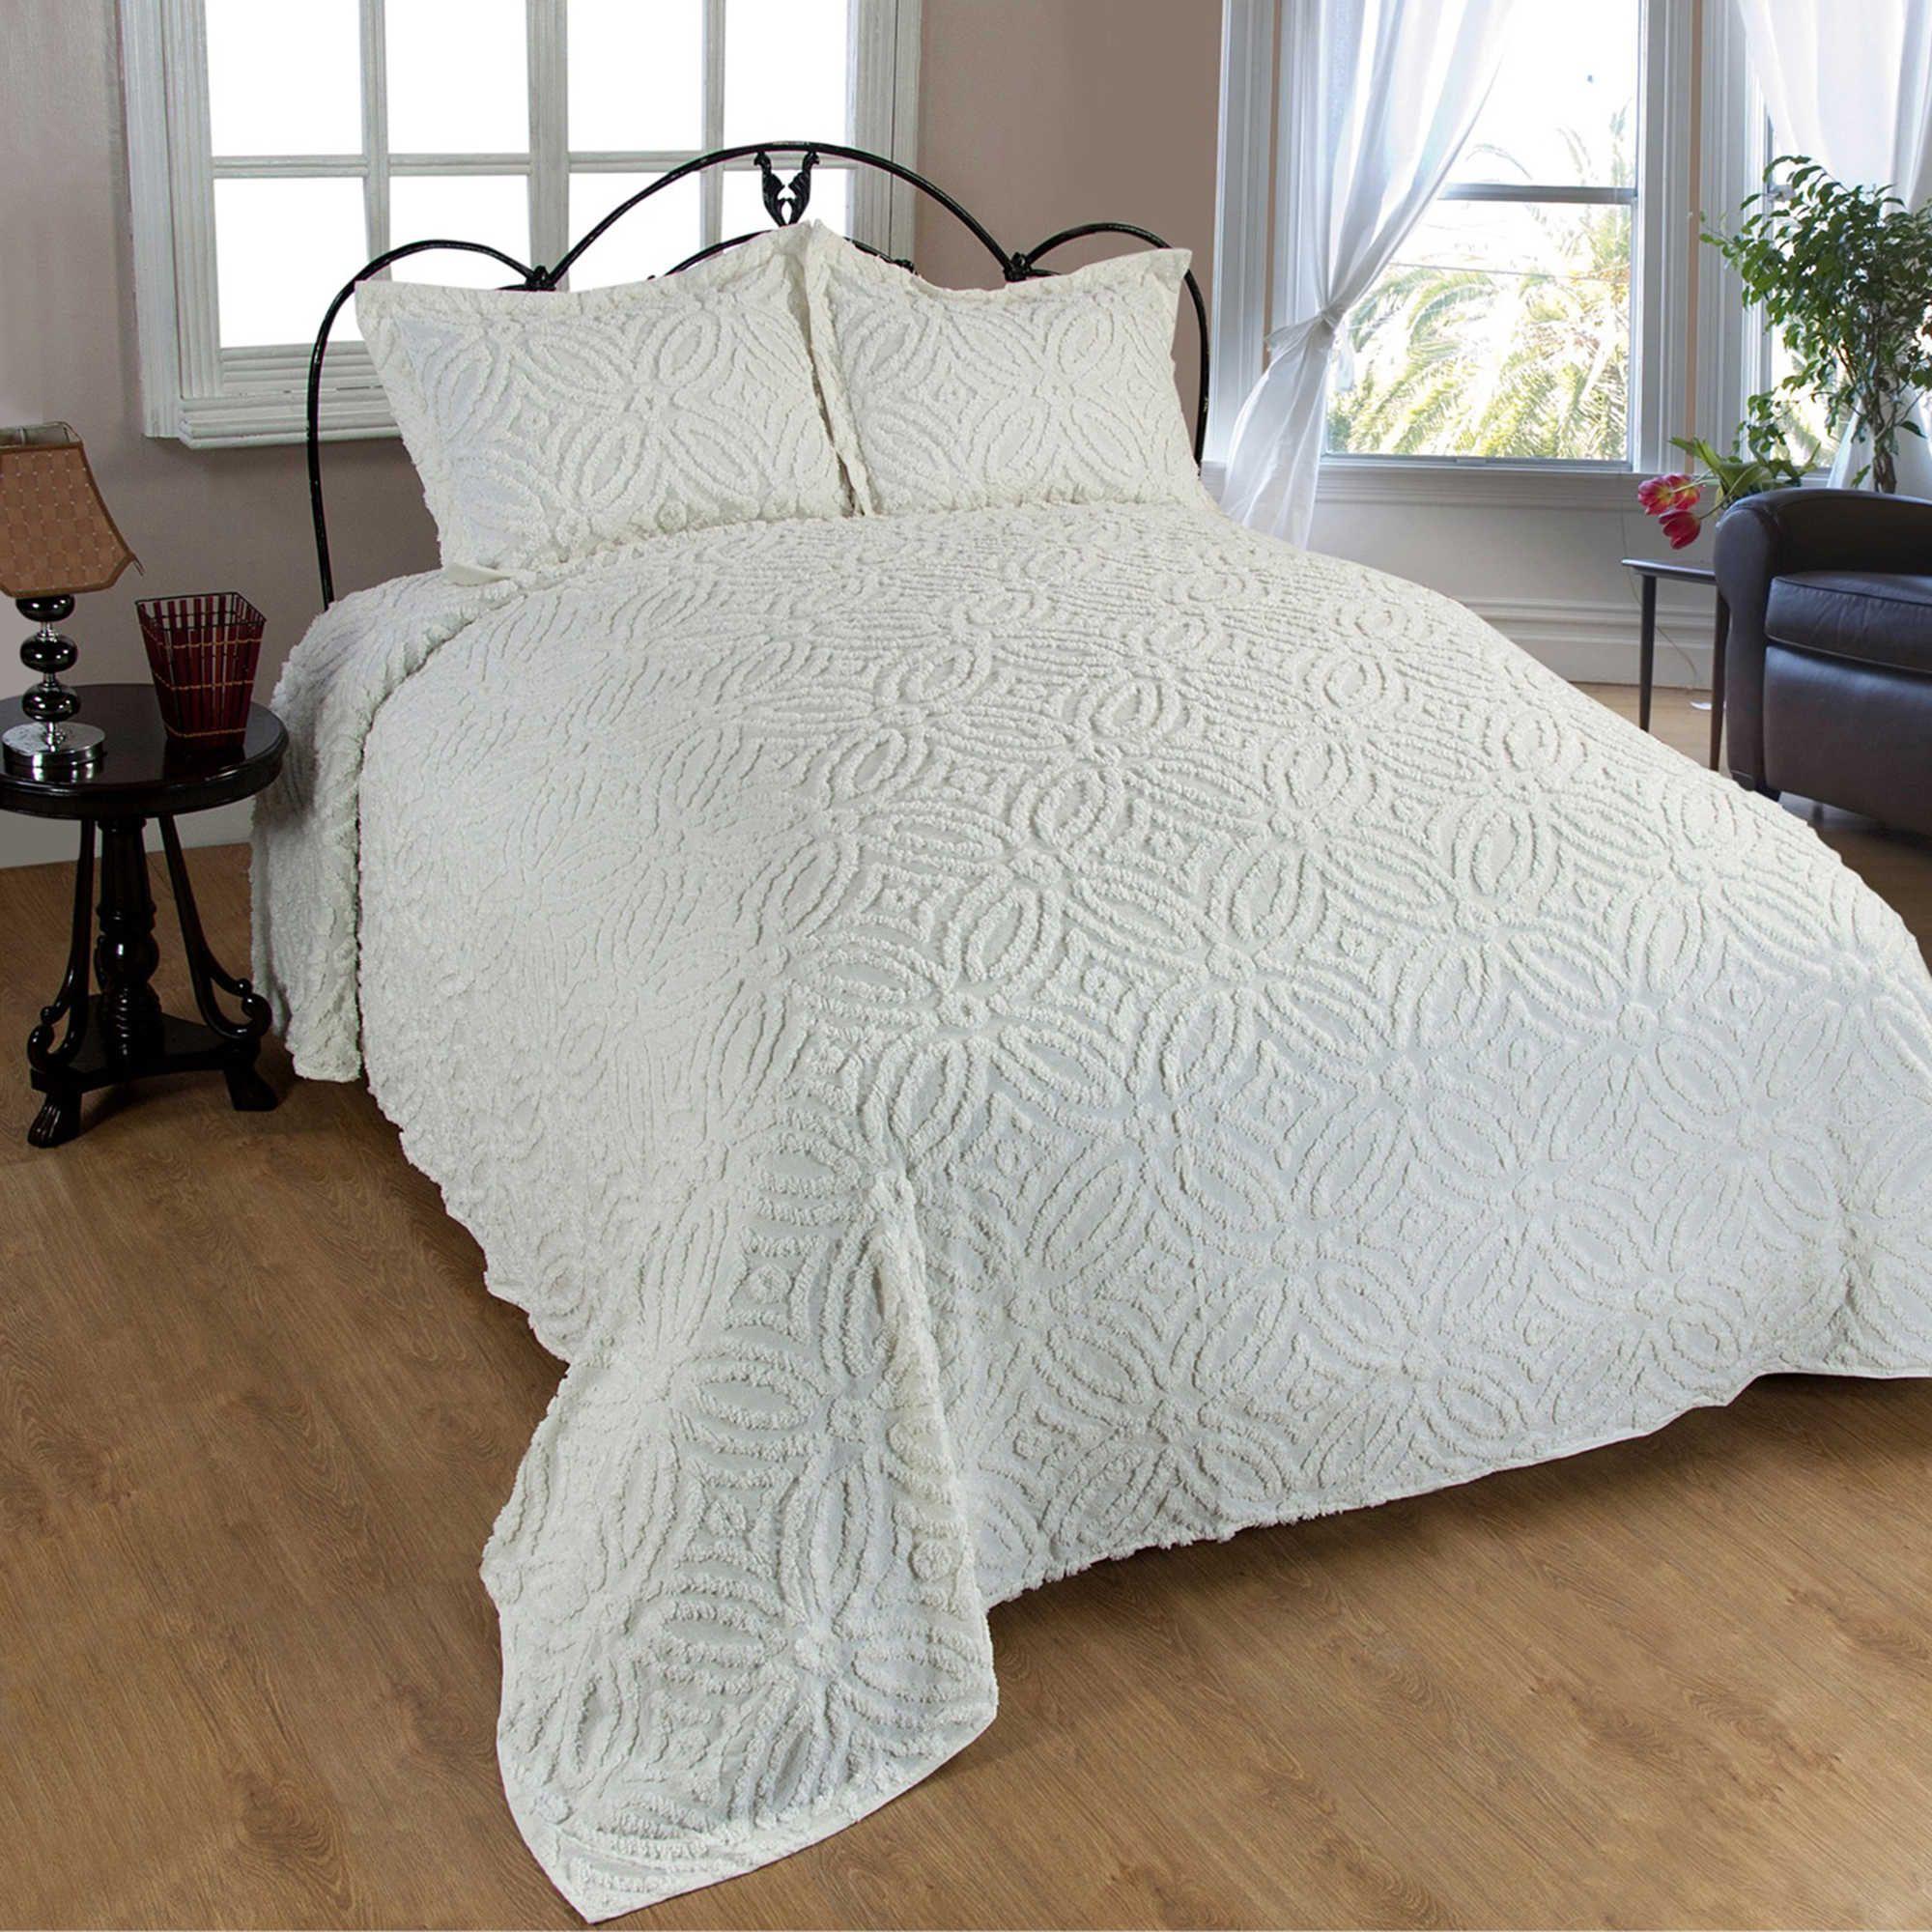 wedding ring chenille queen bedspread in ivory cottage bedroom ideas pinterest. Black Bedroom Furniture Sets. Home Design Ideas